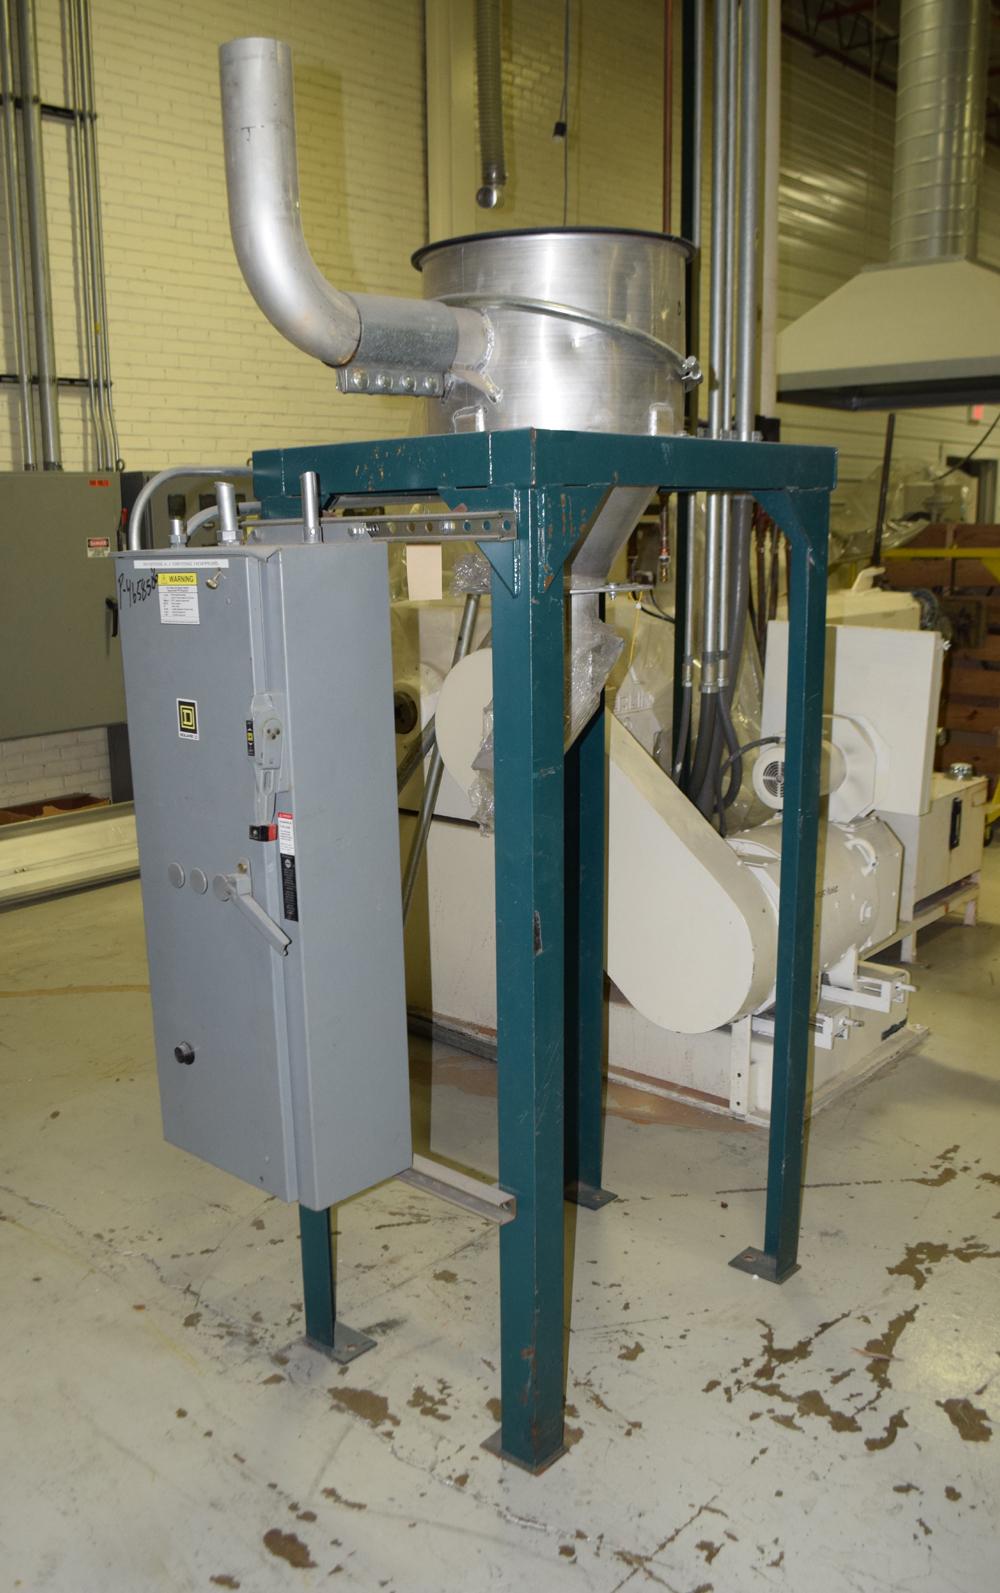 Lot 214 - Walton Stout Vacuum Loading System